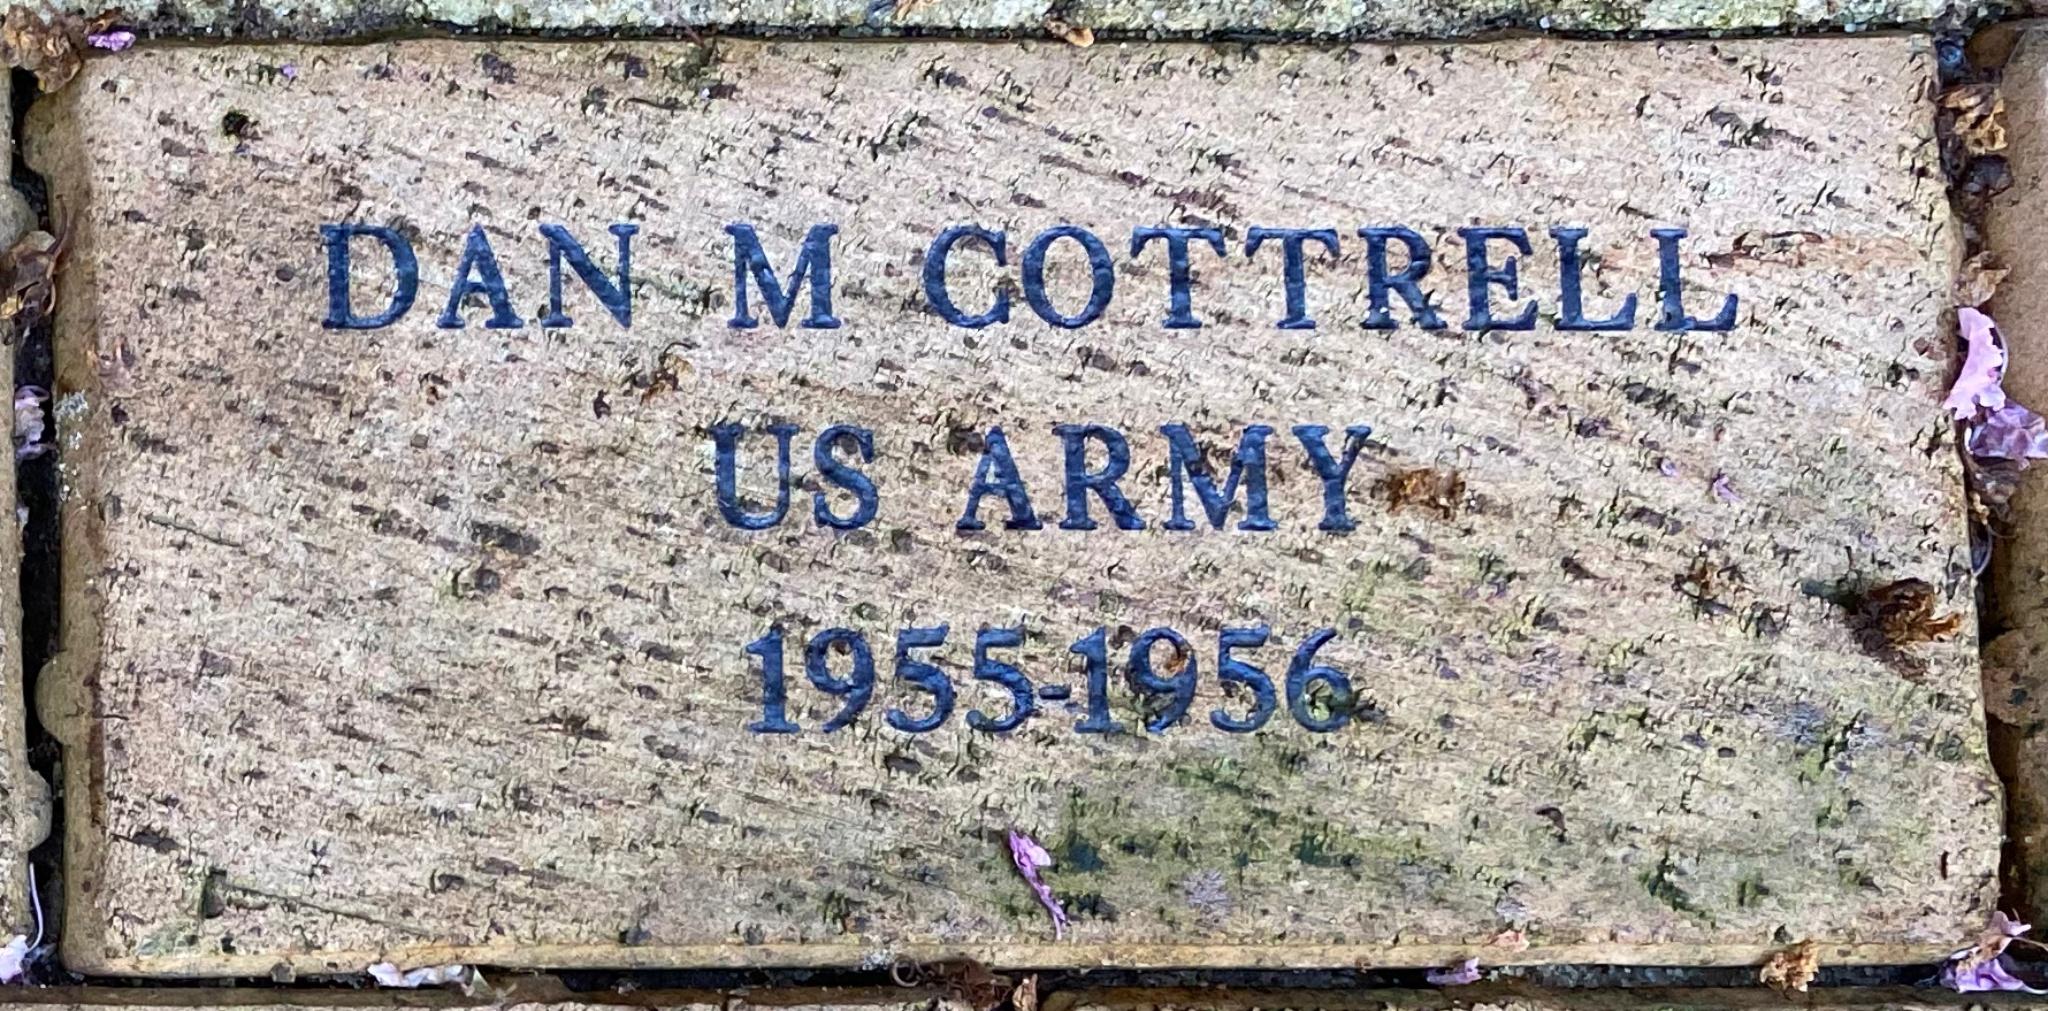 DAN M COTTRELL US ARMY 1955-1956